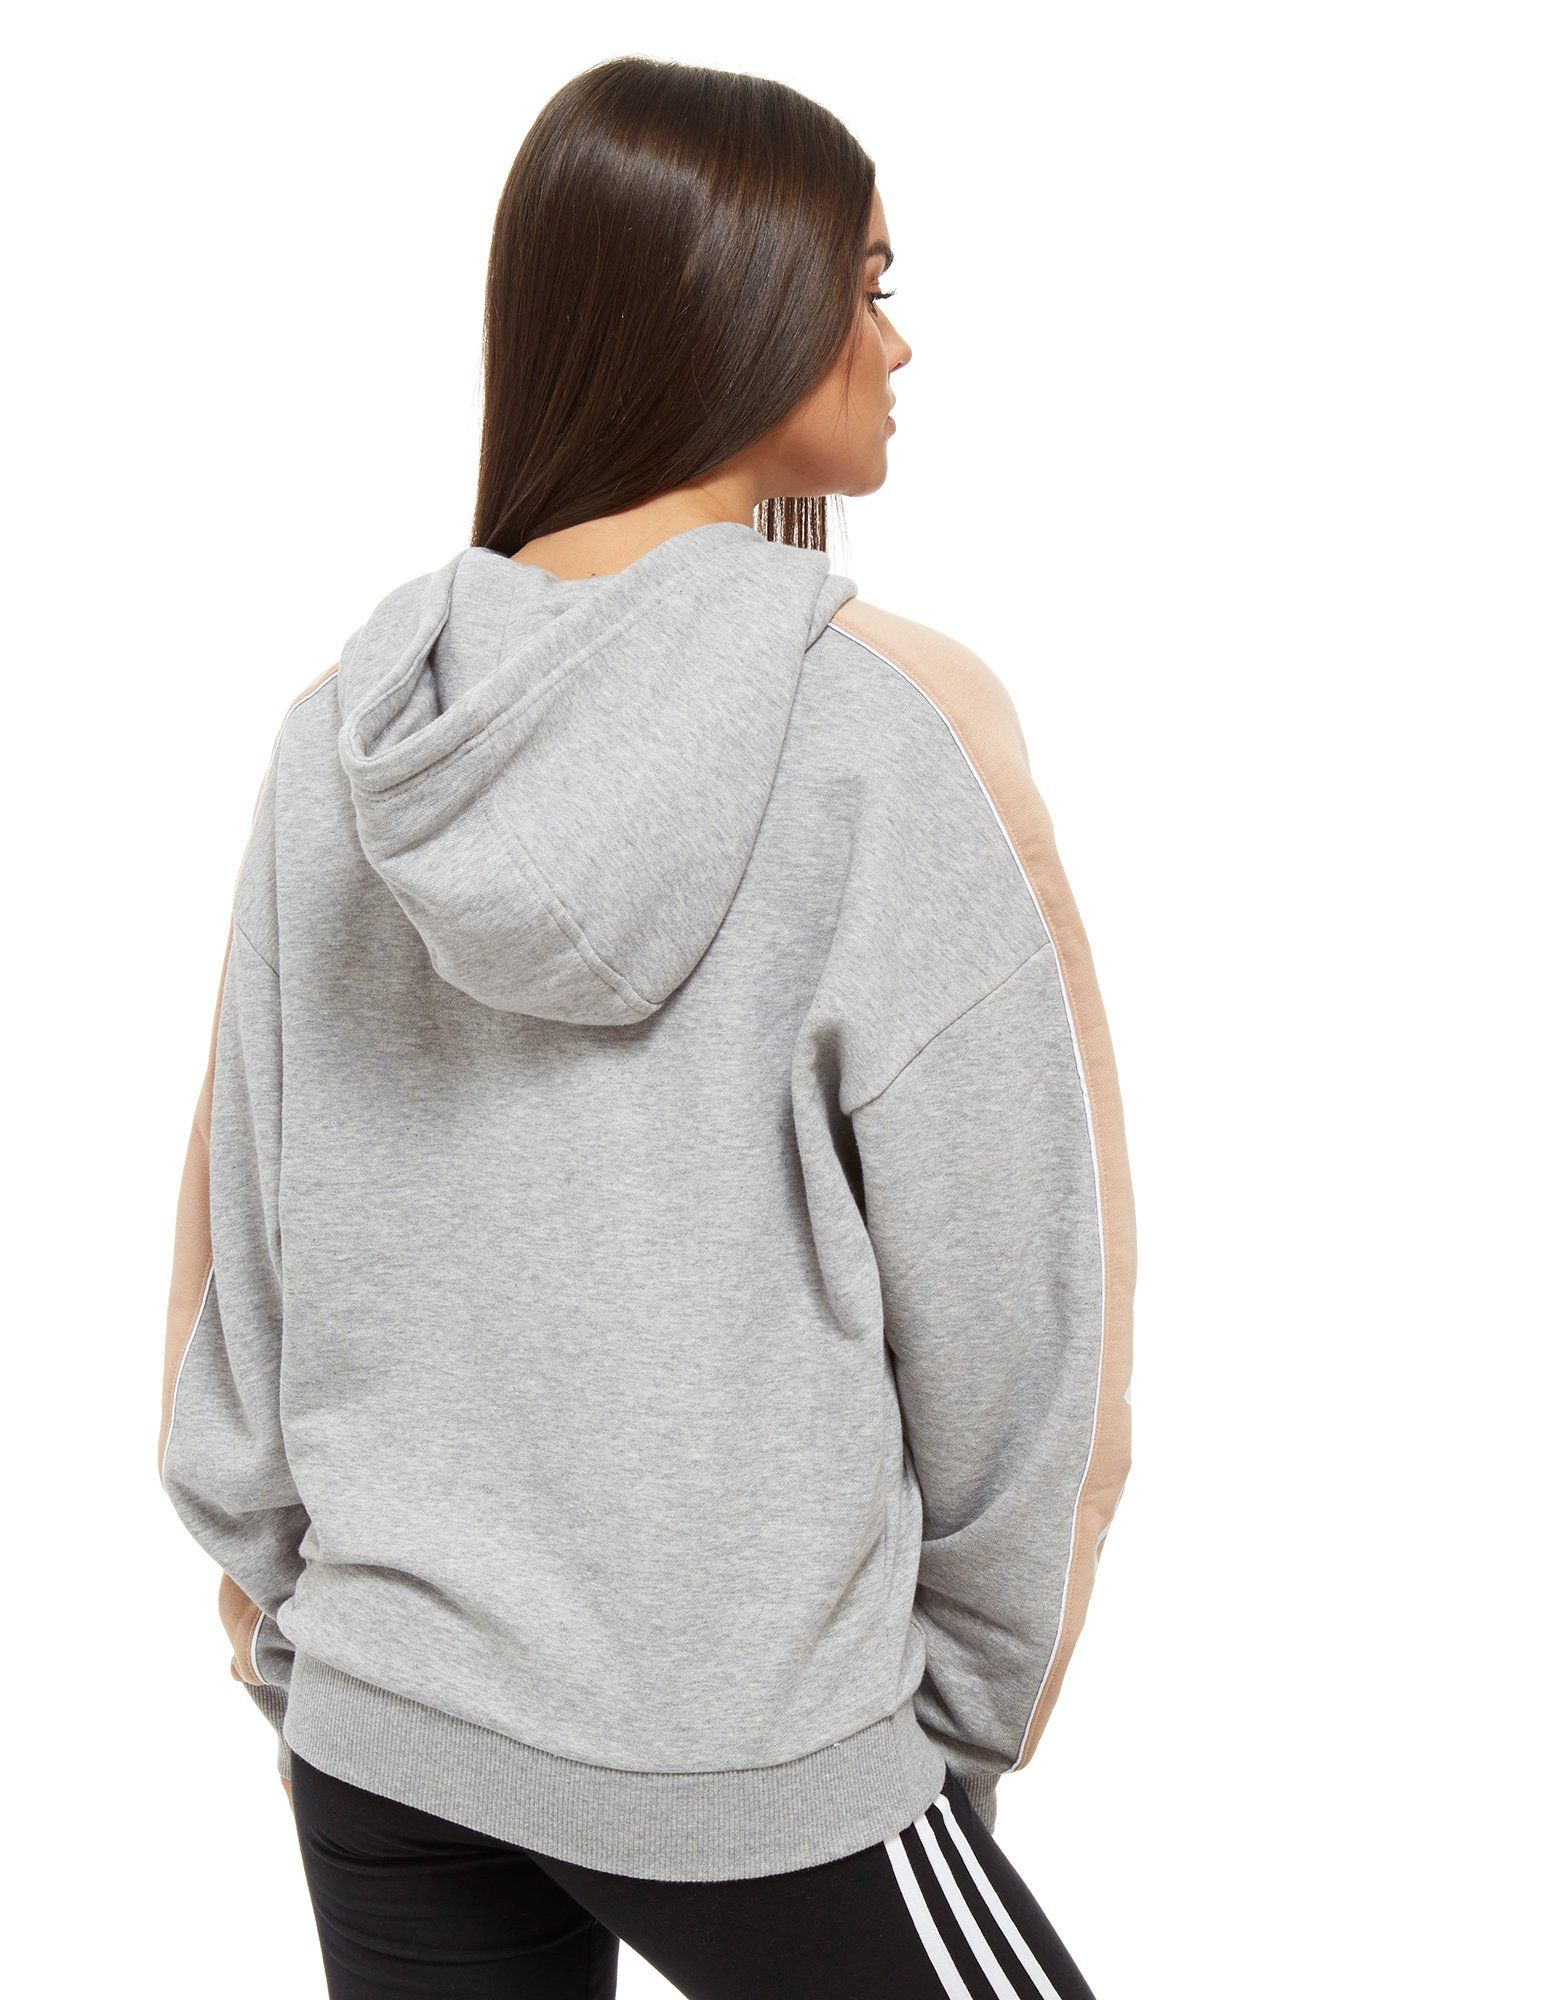 adidas Originals Linear Halbrei脽verschluss Kapuzenpullover Grau